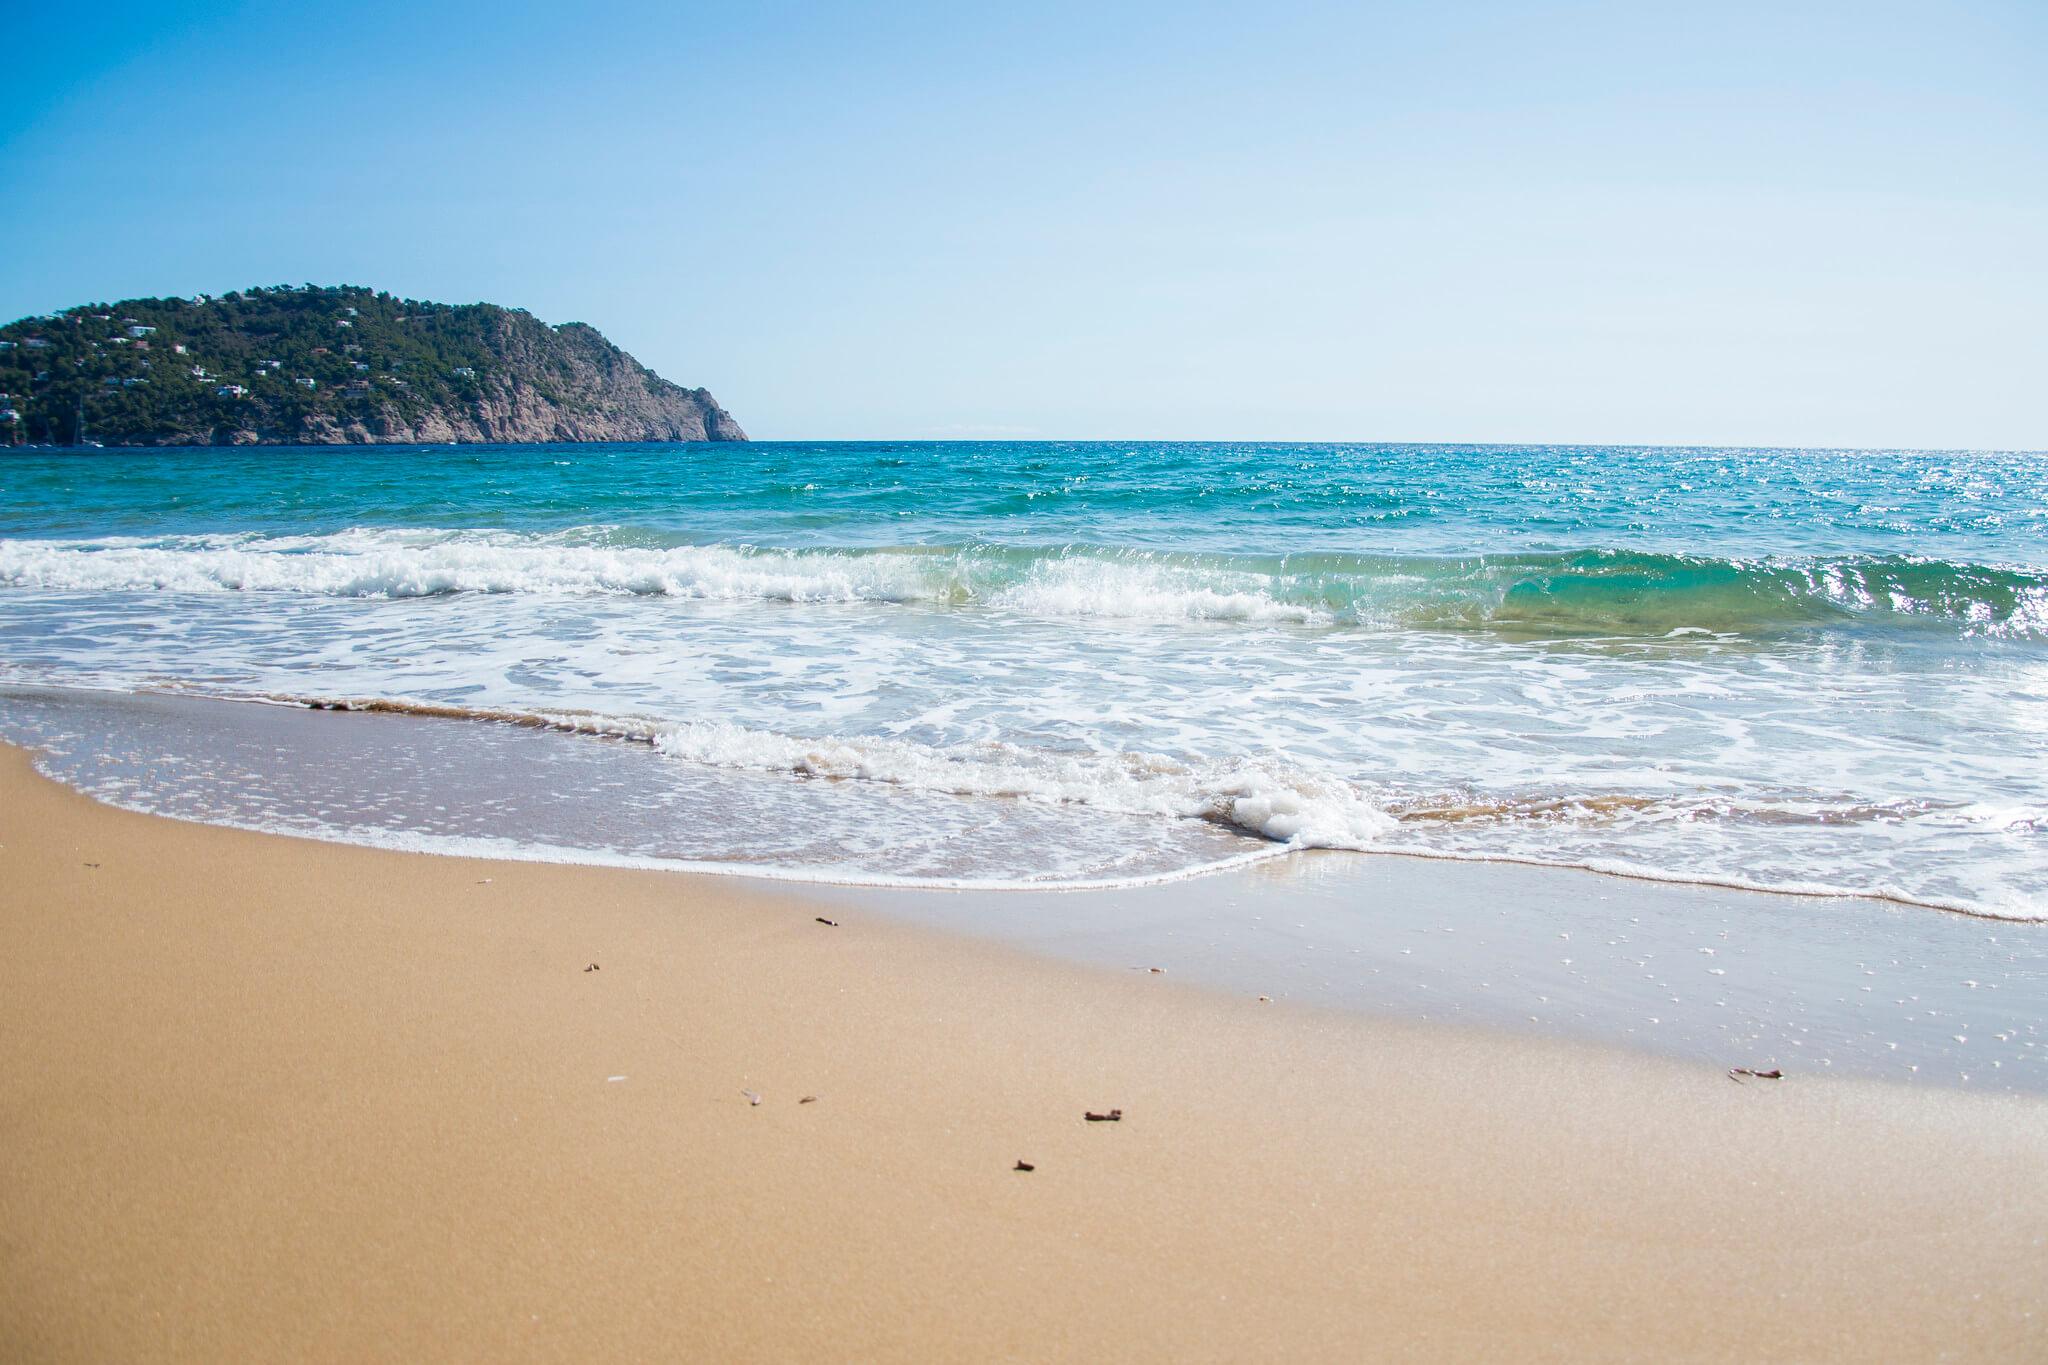 https://www.white-ibiza.com/wp-content/uploads/2020/03/ibiza-beaches-aguas-blancas-04.jpg